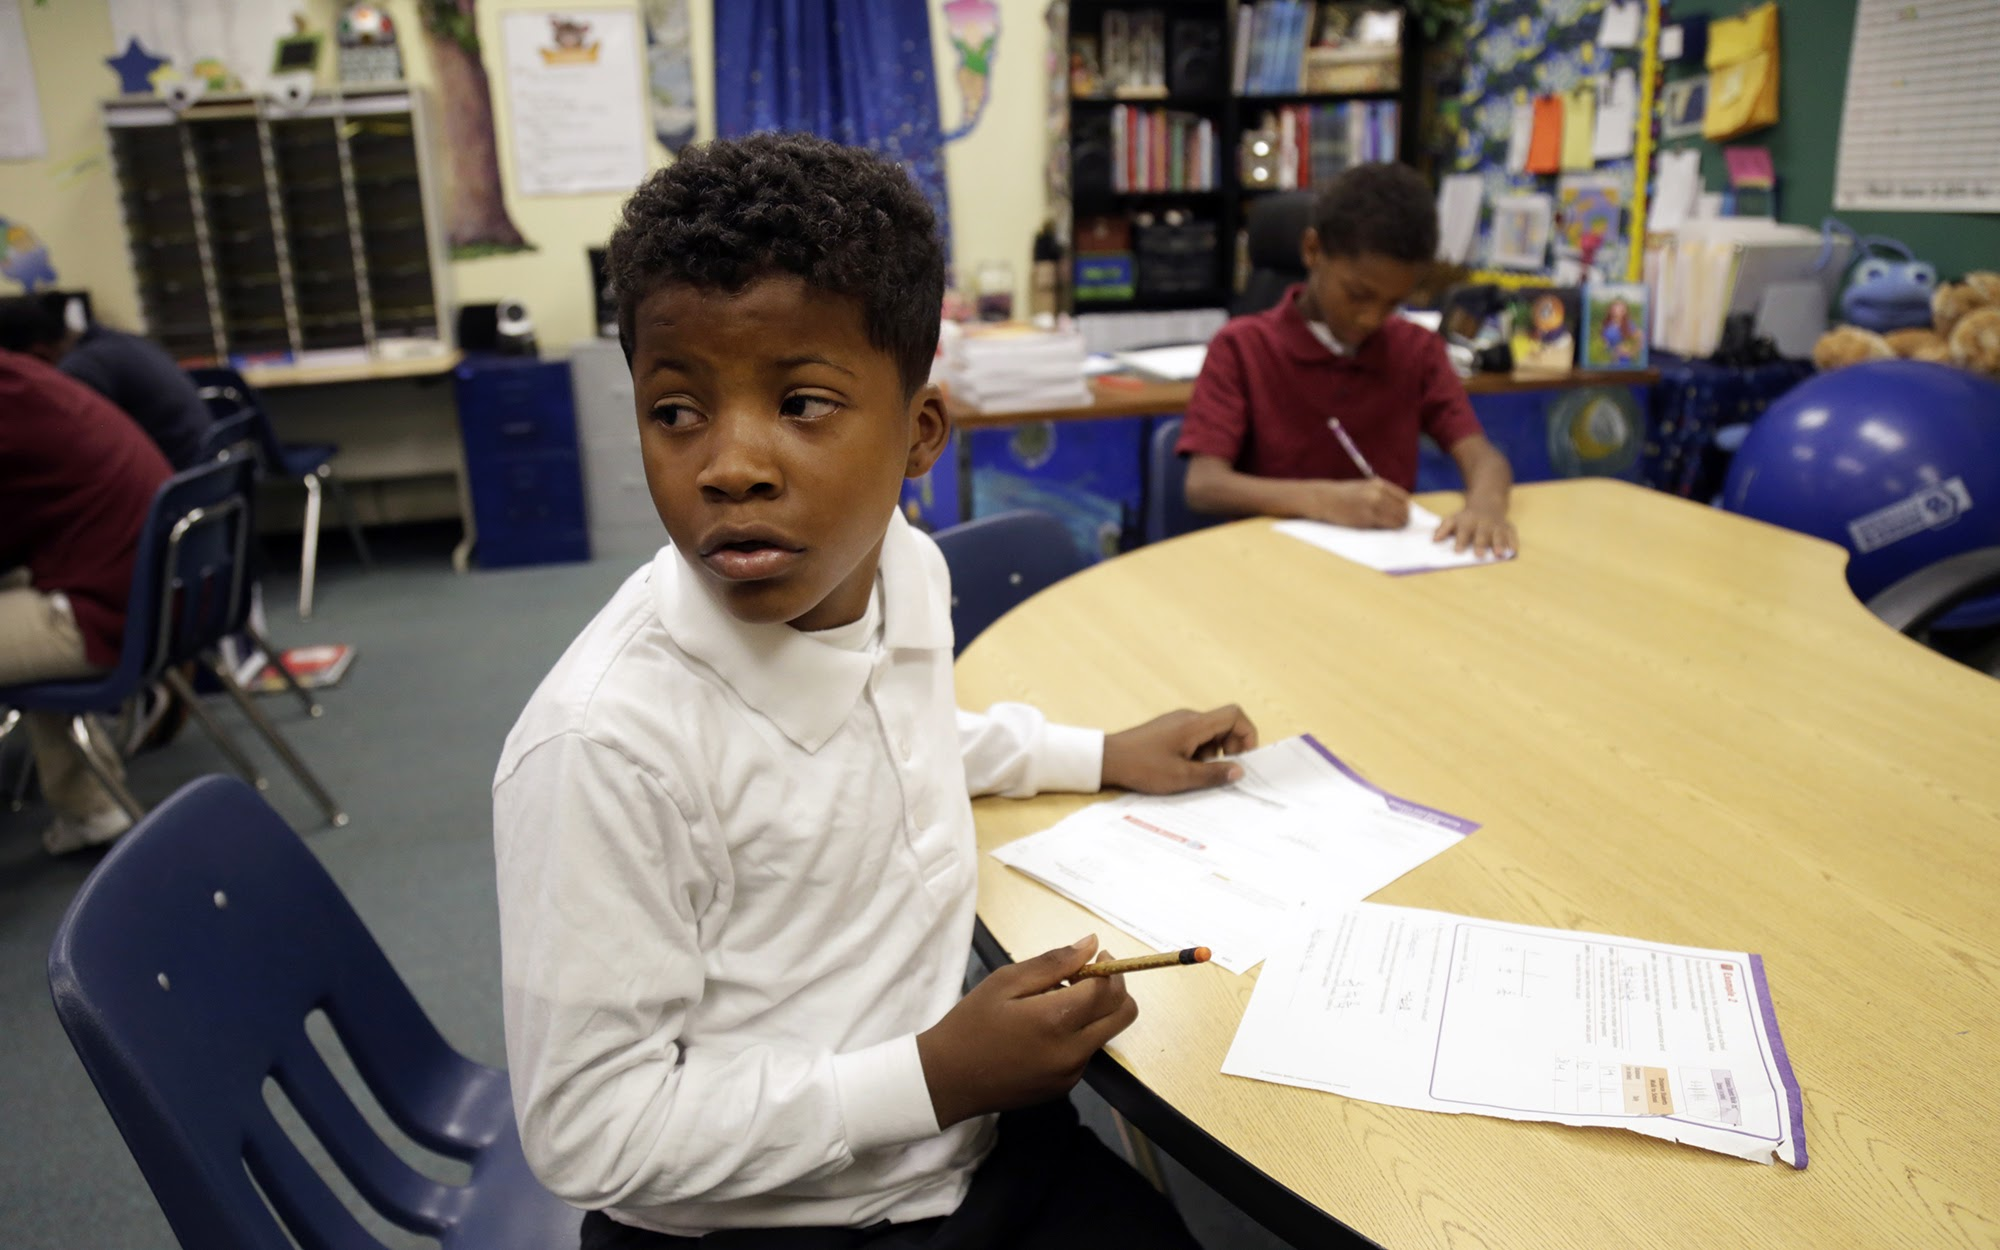 Barrett Elementary School fourth grader Bréyon Burt, 9, works on a line plot in math class on Nov. 1, 2017. (Photo by Ryan Loew/PublicSource)